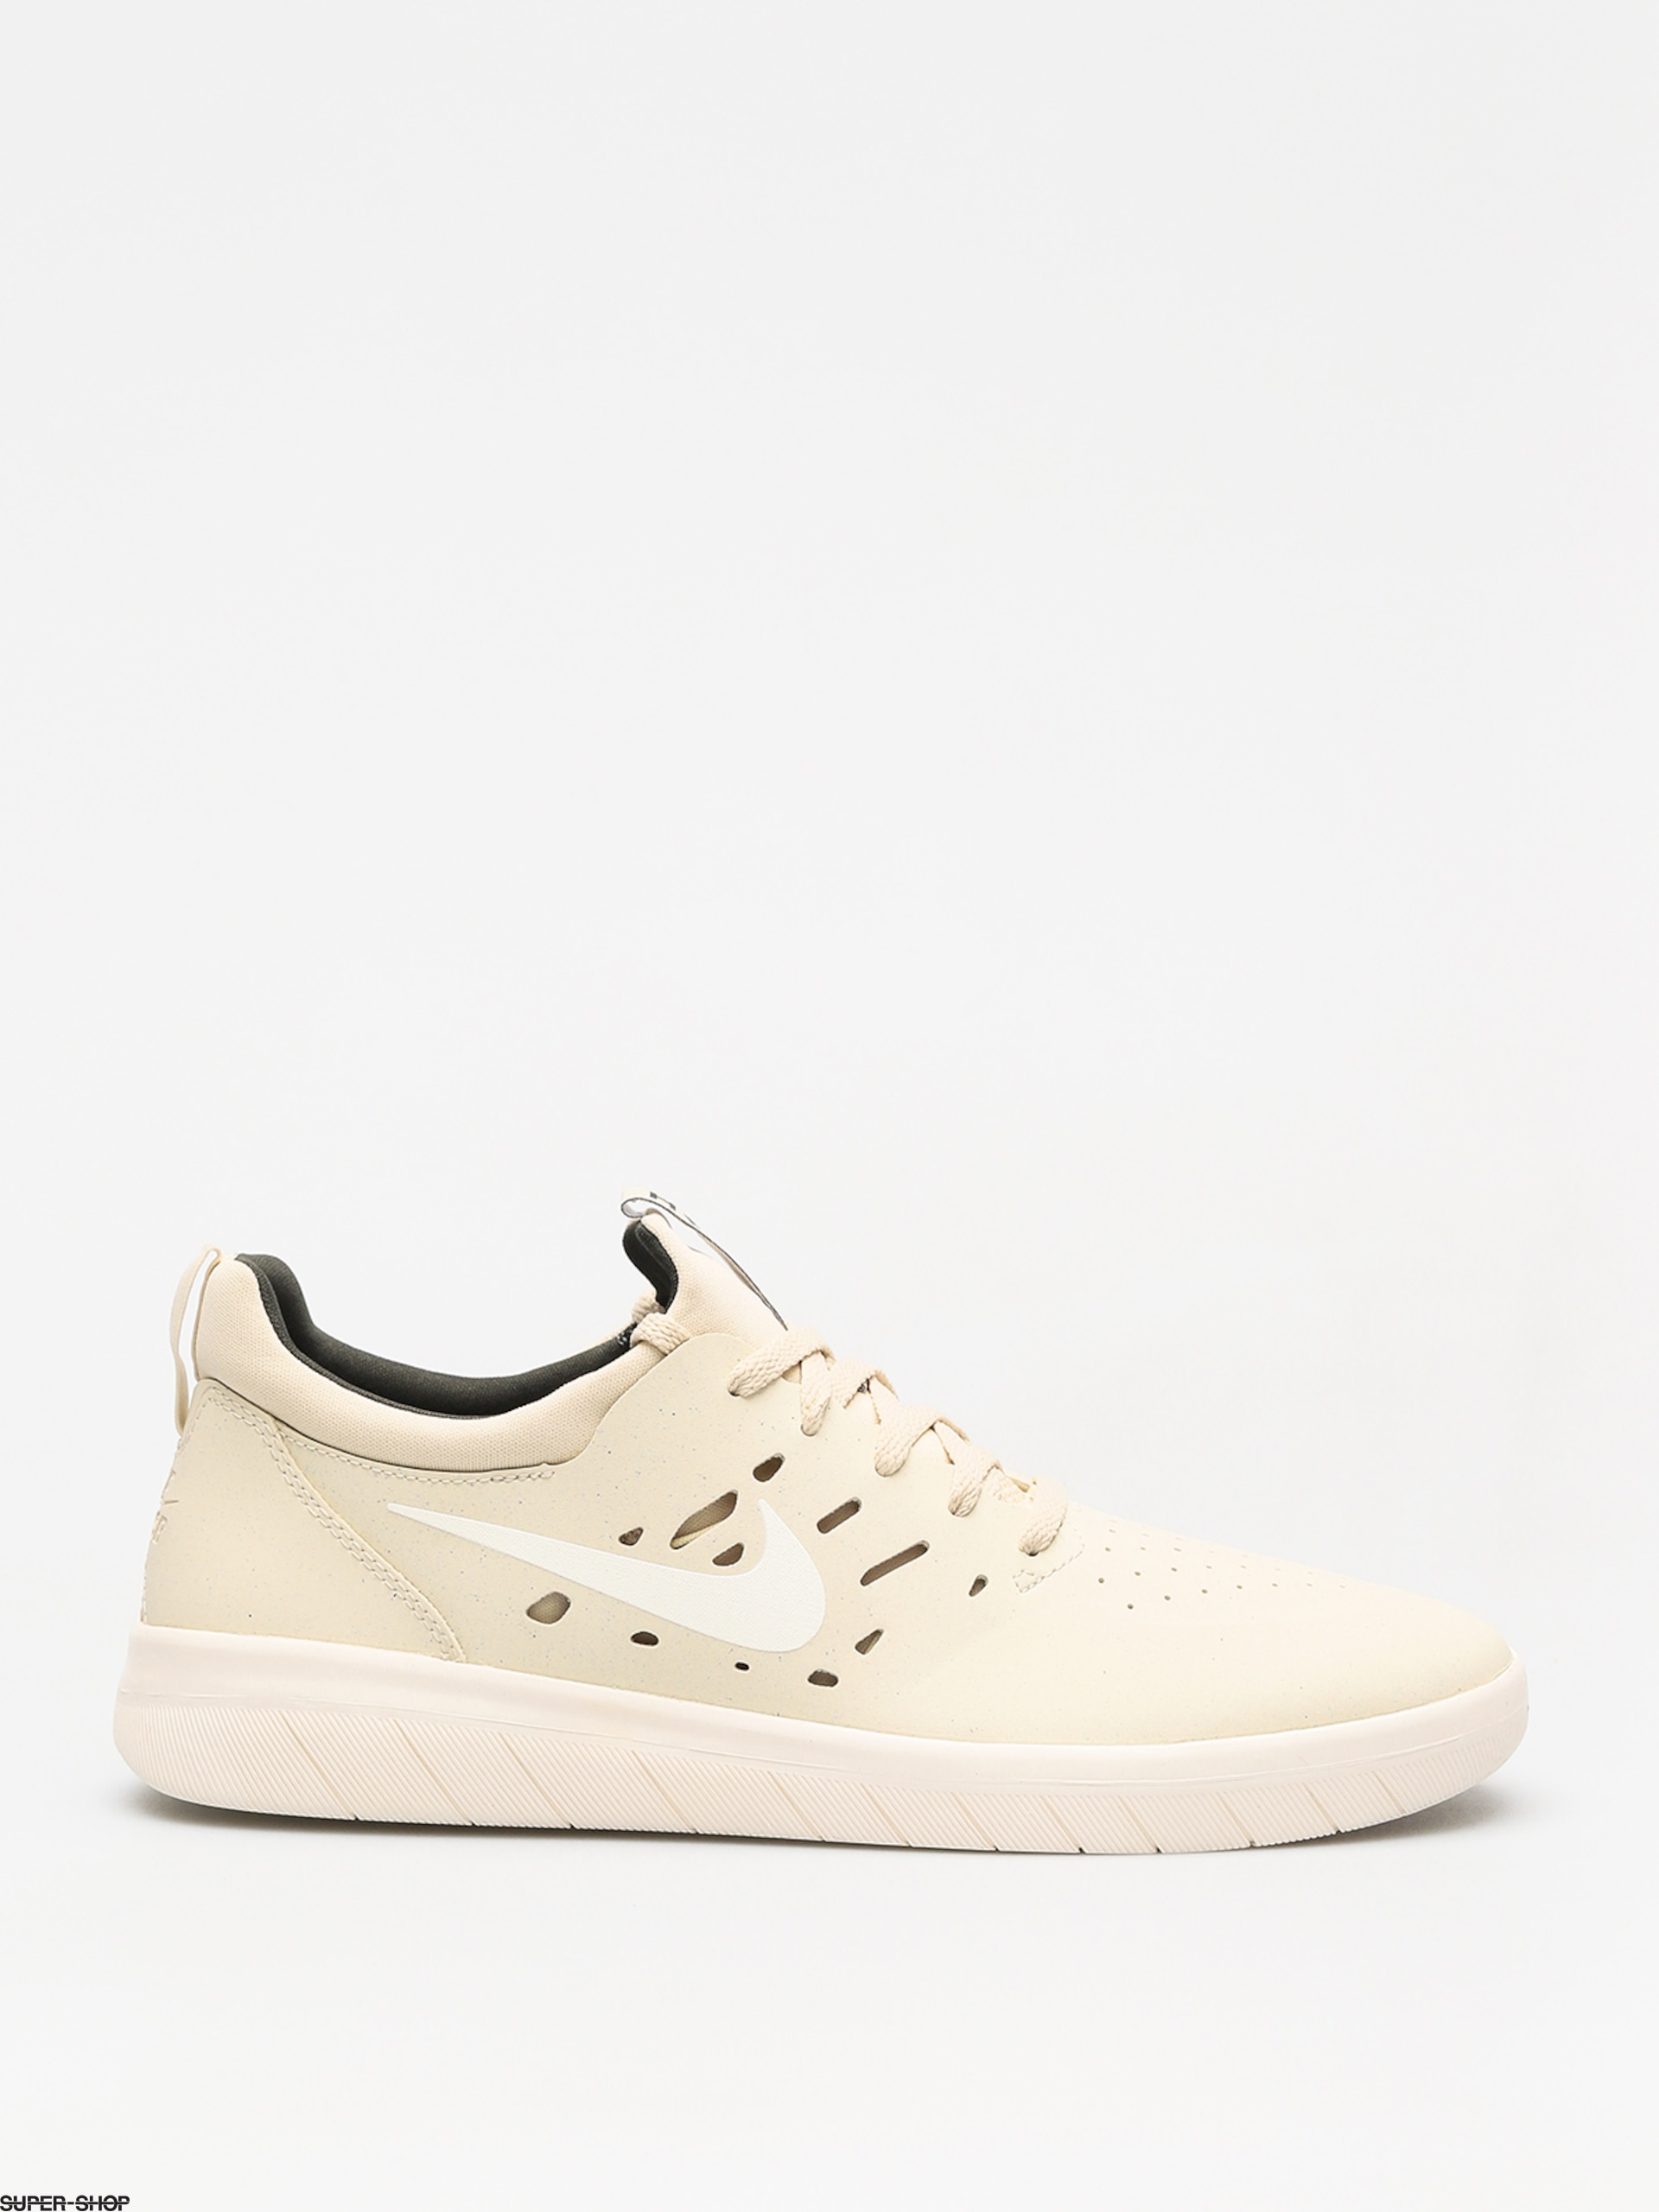 new style 489a4 0e315 Nike SB Nyjah Free Shoes (beach sail sequoia)